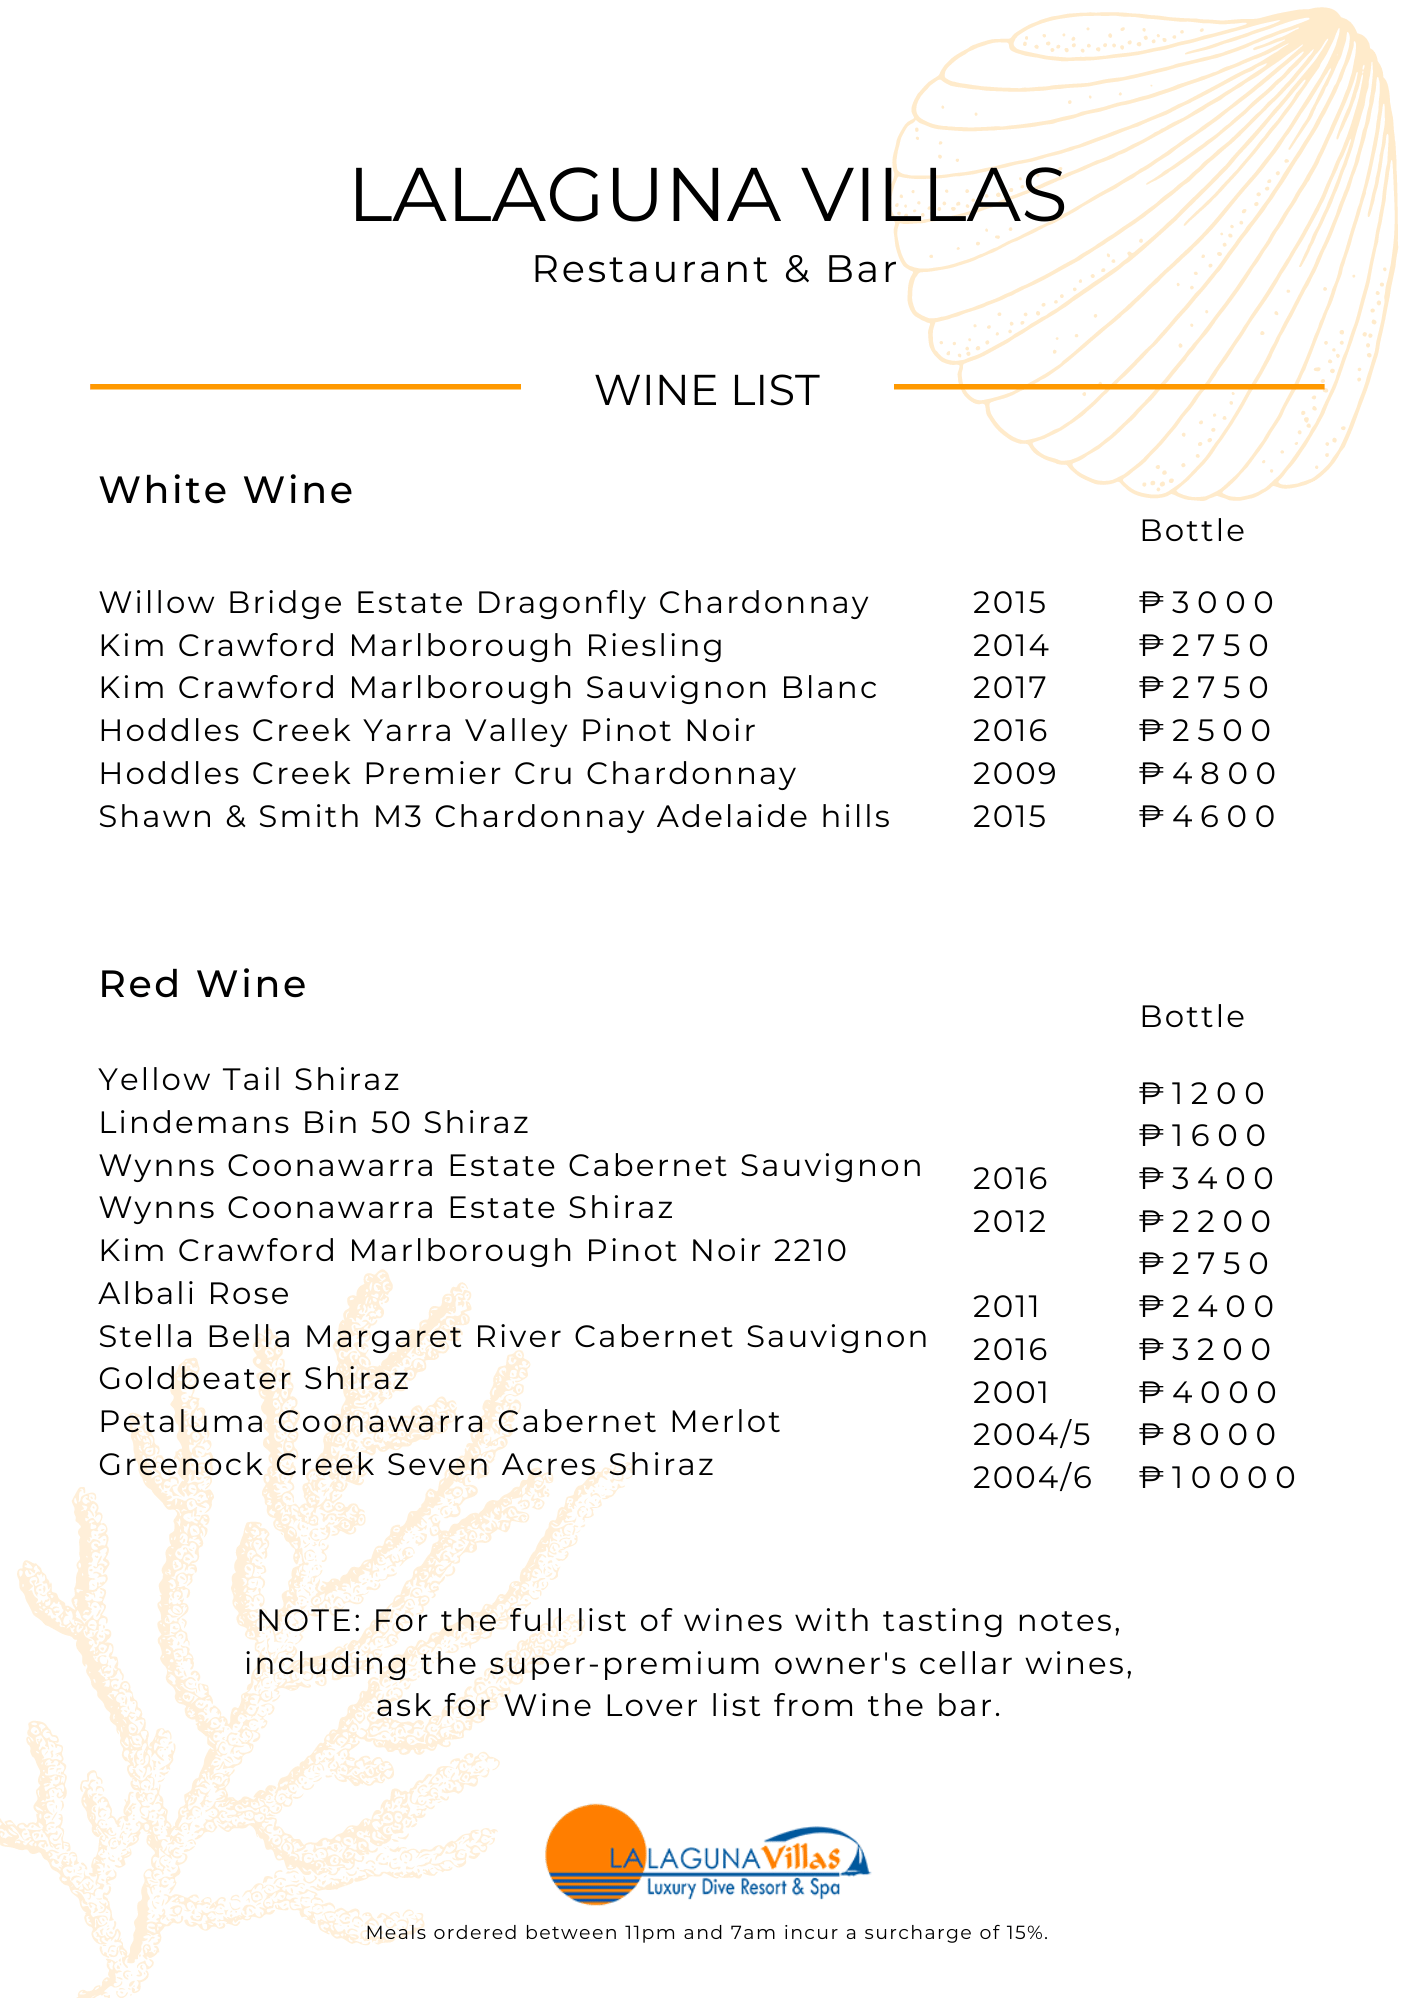 Lalaguna Villas Puerto Galera Wine List 2